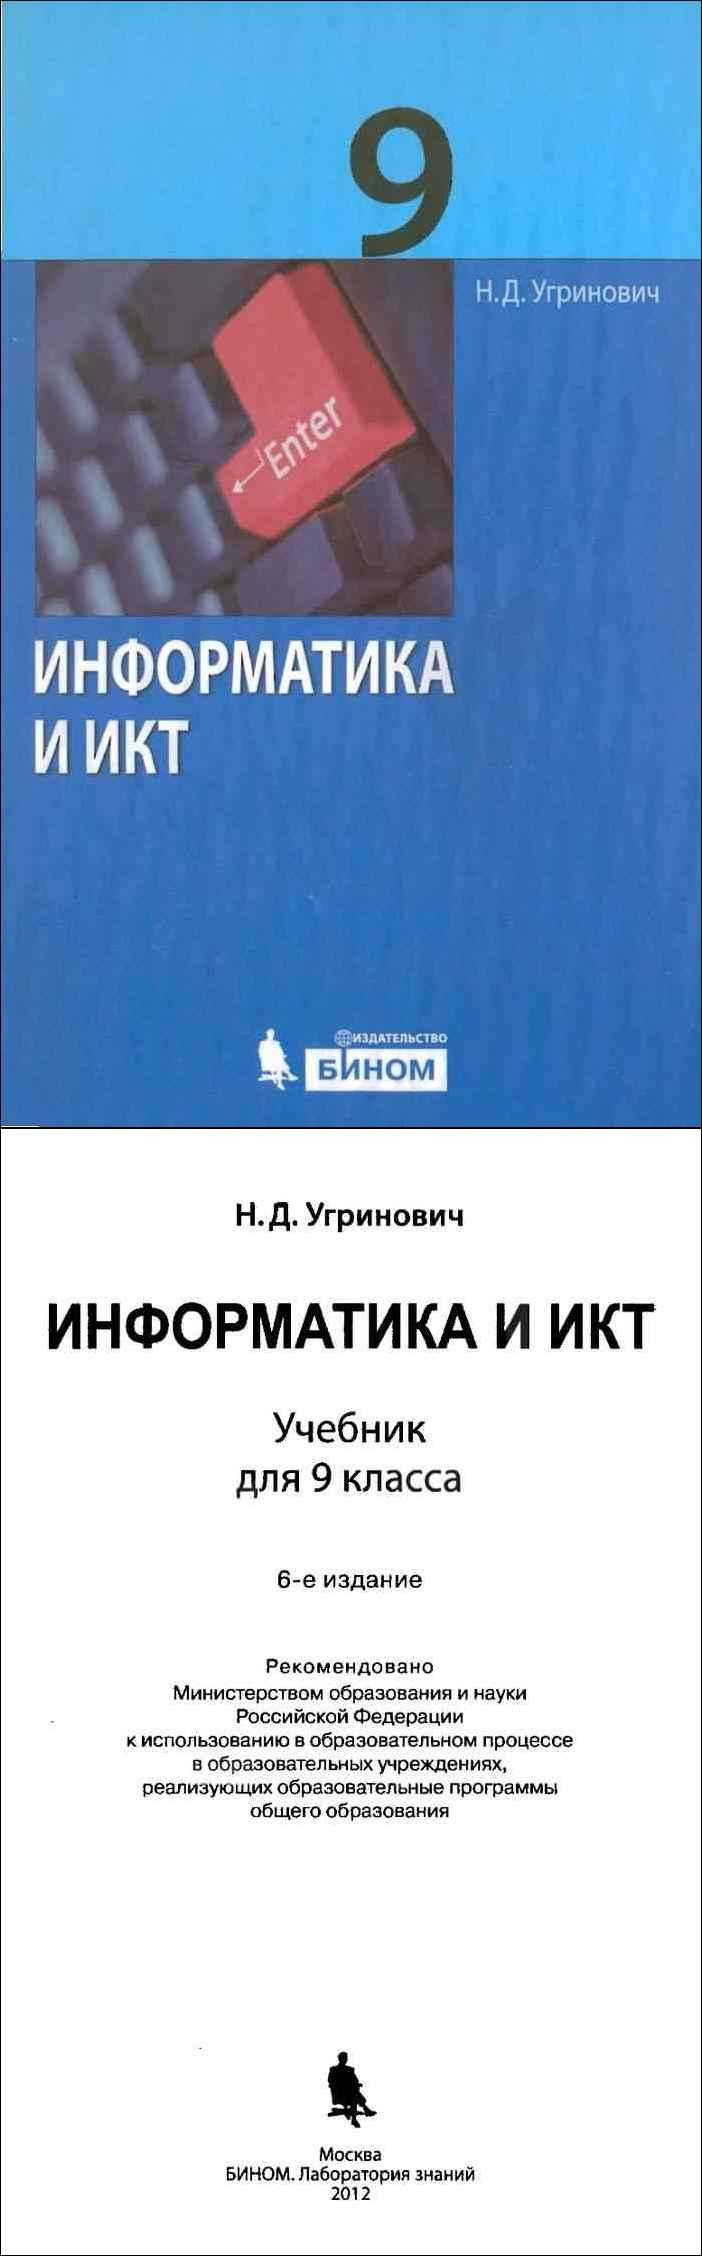 Информатика, 9 класс, угринович н. Д. , 2016.